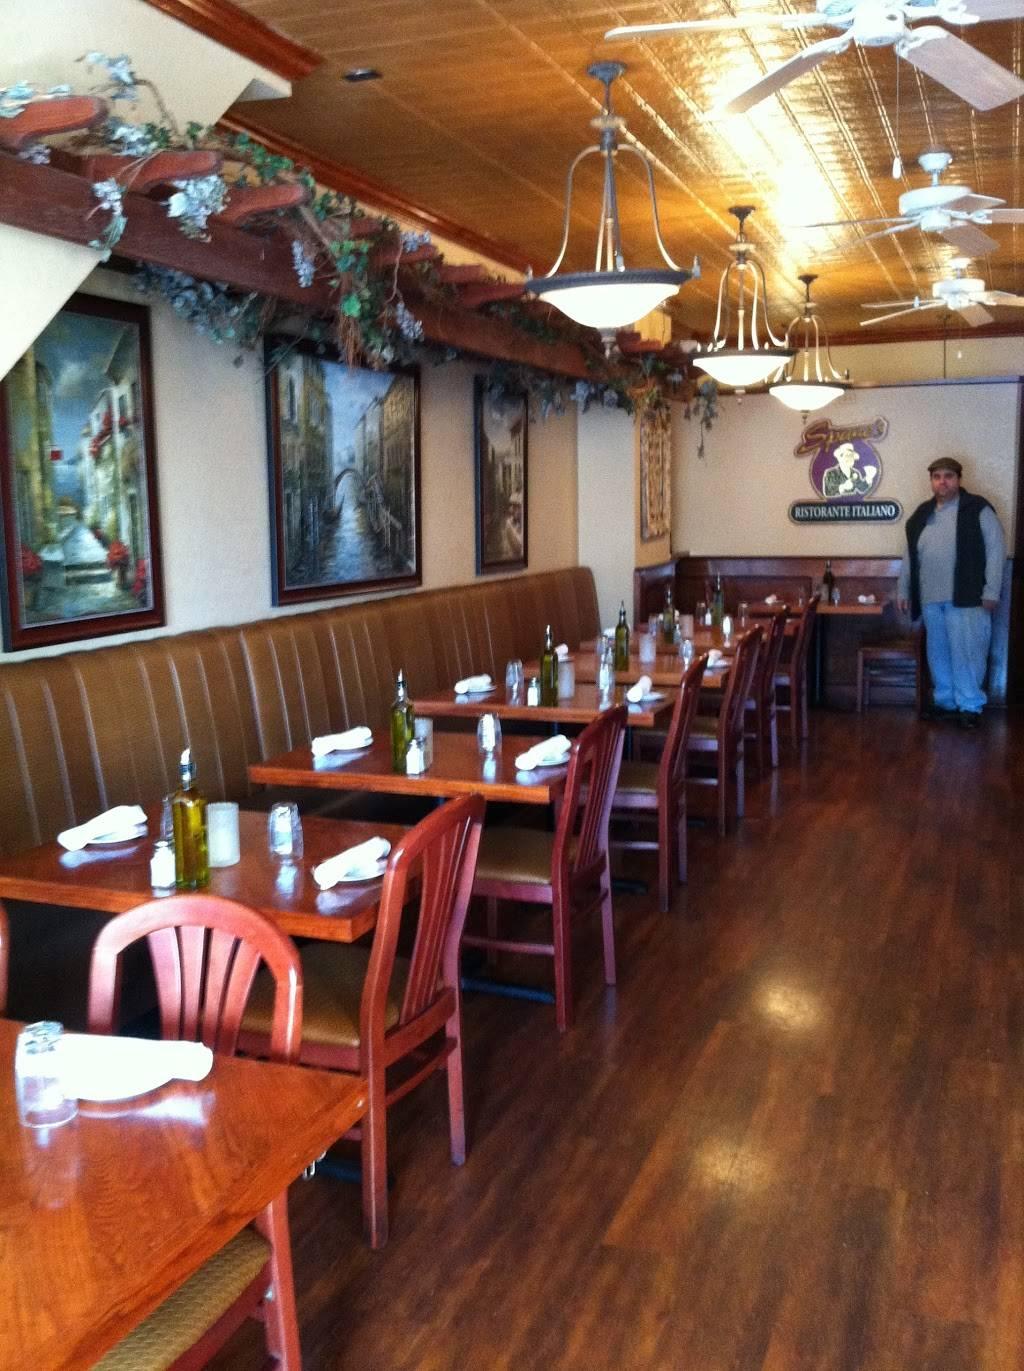 Spanos Ristorante Italiano | restaurant | 719 Arnold Ave, Point Pleasant Beach, NJ 08742, USA | 7327011600 OR +1 732-701-1600